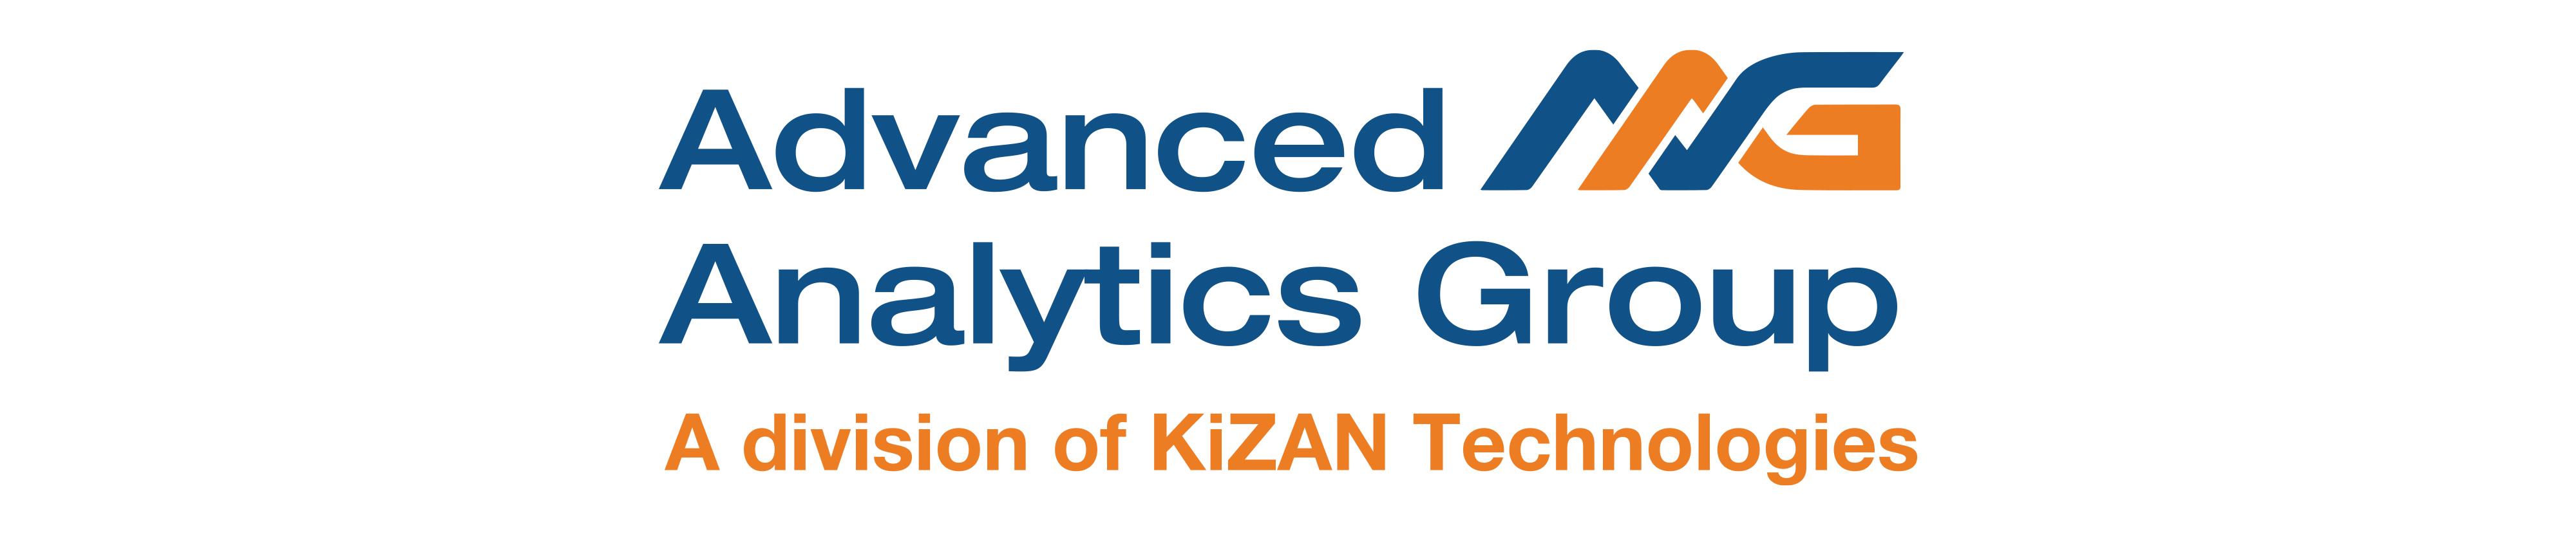 Advanced Analytics Group Banner